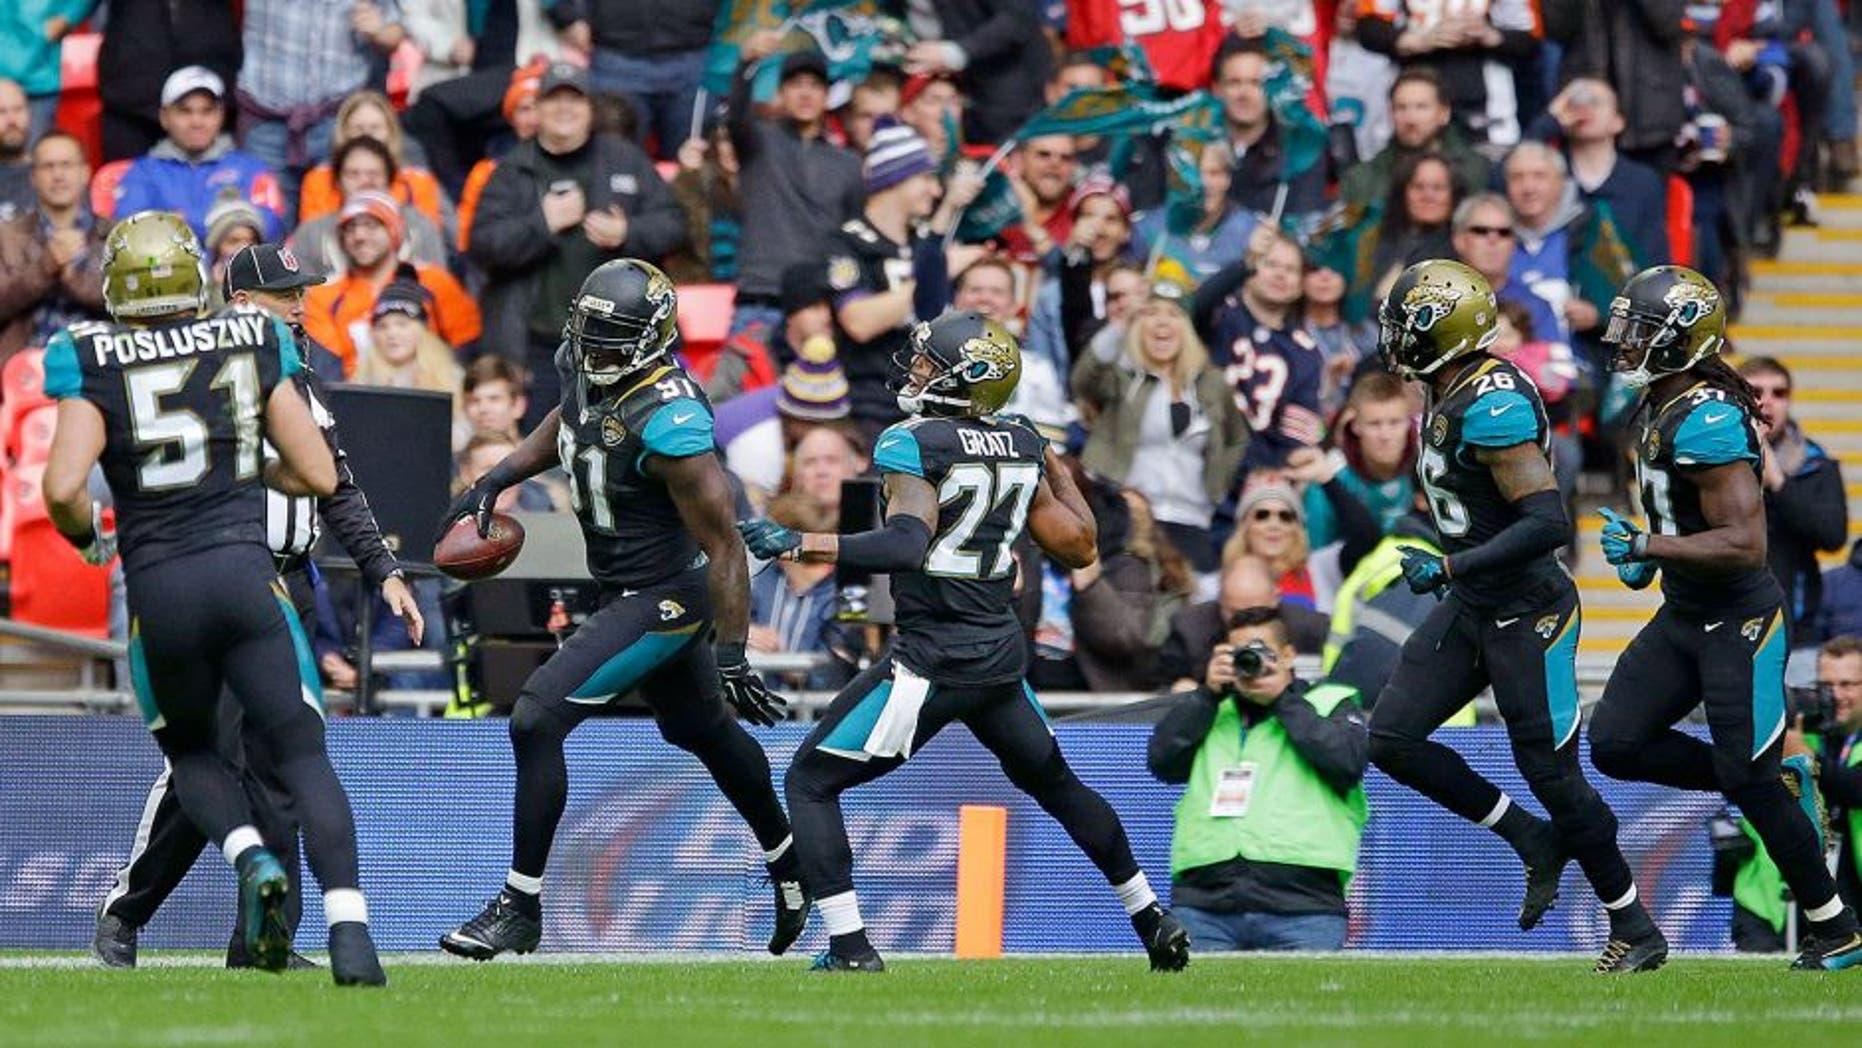 Jacksonville Jaguars defensive end Chris Clemons (91), second left reacts after scoring a touchdown during the NFL game between Buffalo Bills and Jacksonville Jaguars at Wembley Stadium in London, Sunday, Oct. 25, 2015. (AP Photo/Matt Dunham)